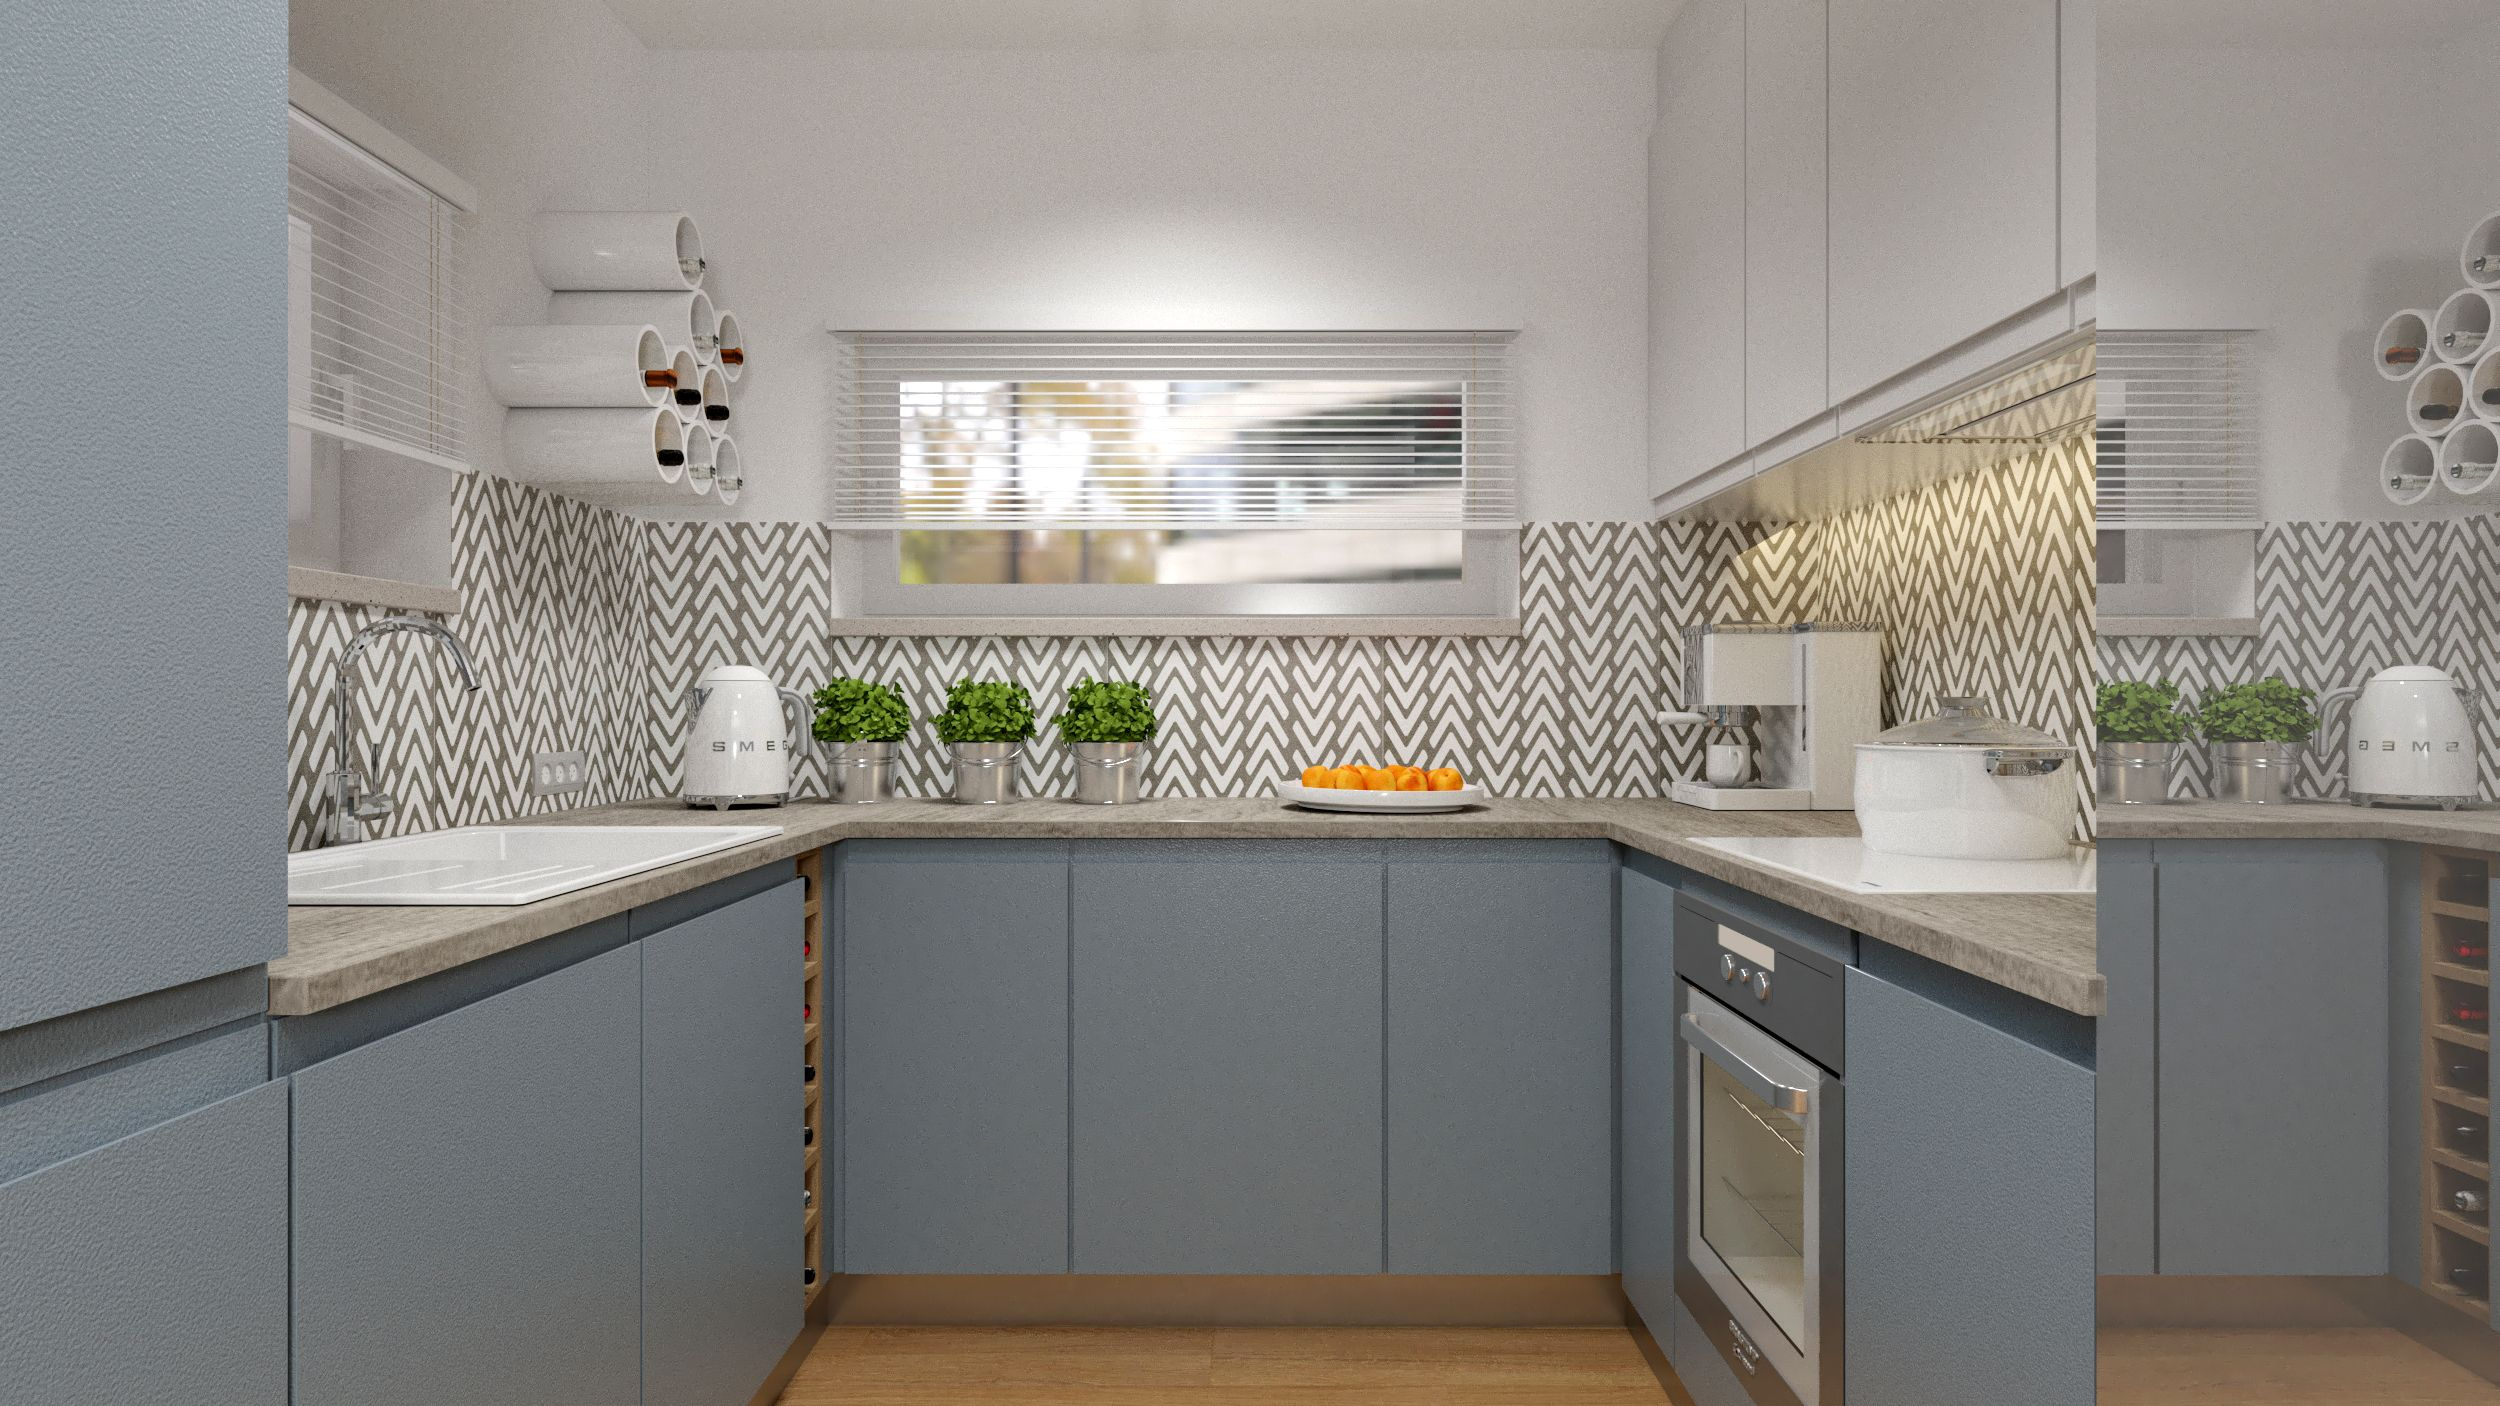 Meble Kuchenne Slupsk Stolarz Slupsk Stol Bud Superstolarz Pl Kitchen Cabinets Decor Kitchen